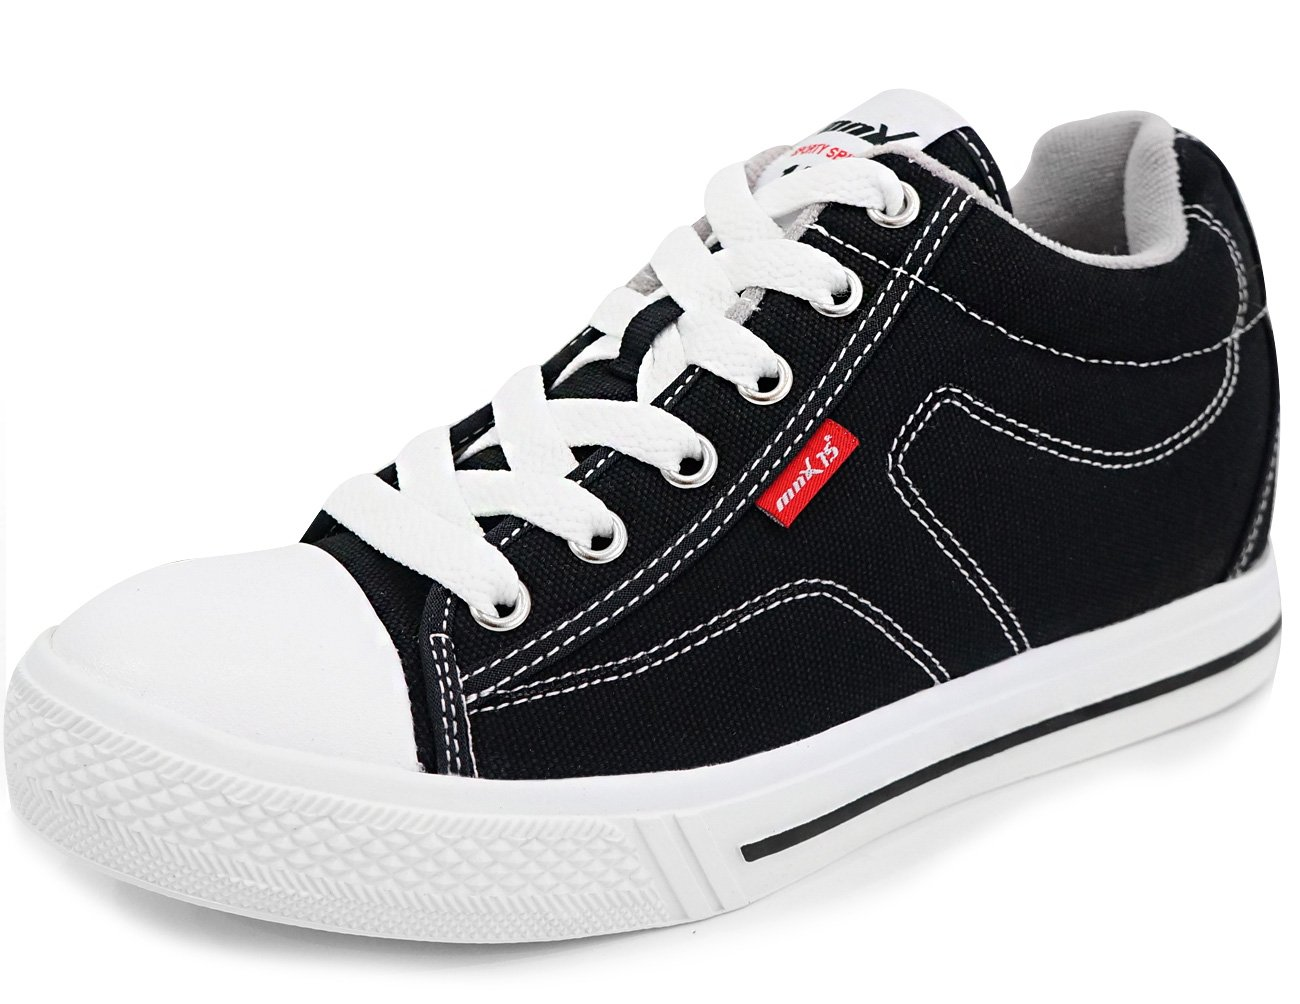 MNX15 Men's Elevator Shoes Height Increase 2.3'' CANVAS BLACK (6 D(M)US / 240mm(KOR), black)